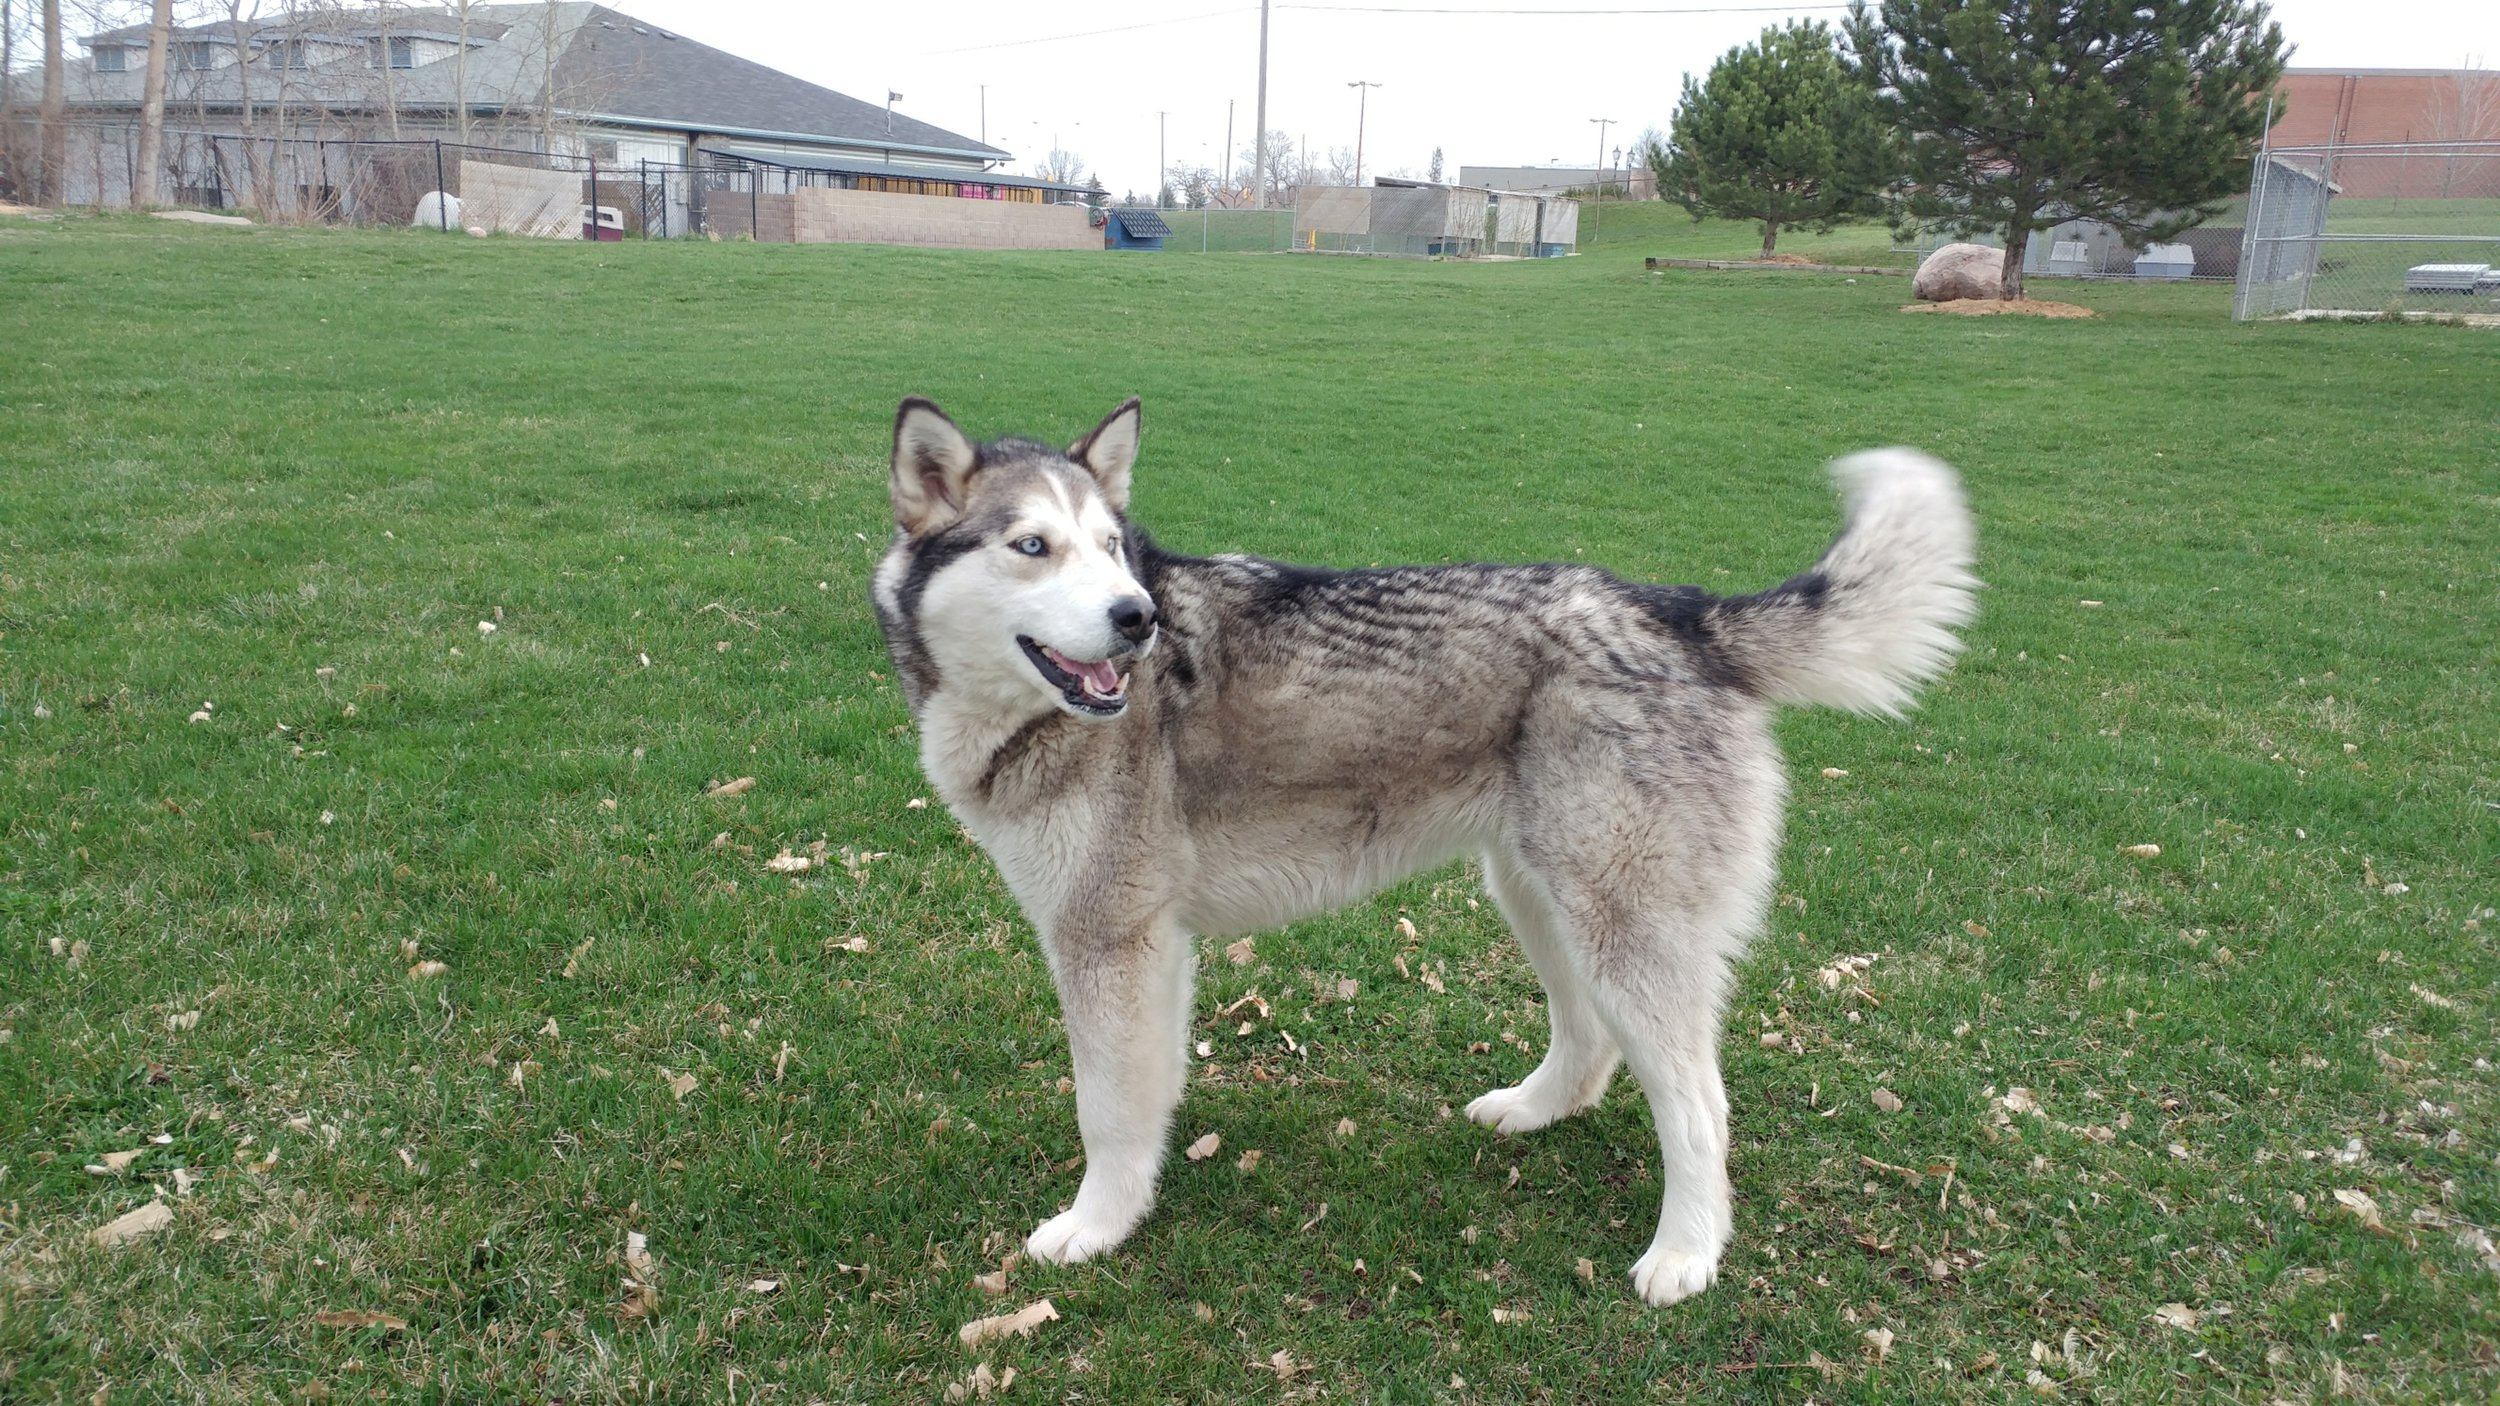 Northern dog named Jewel